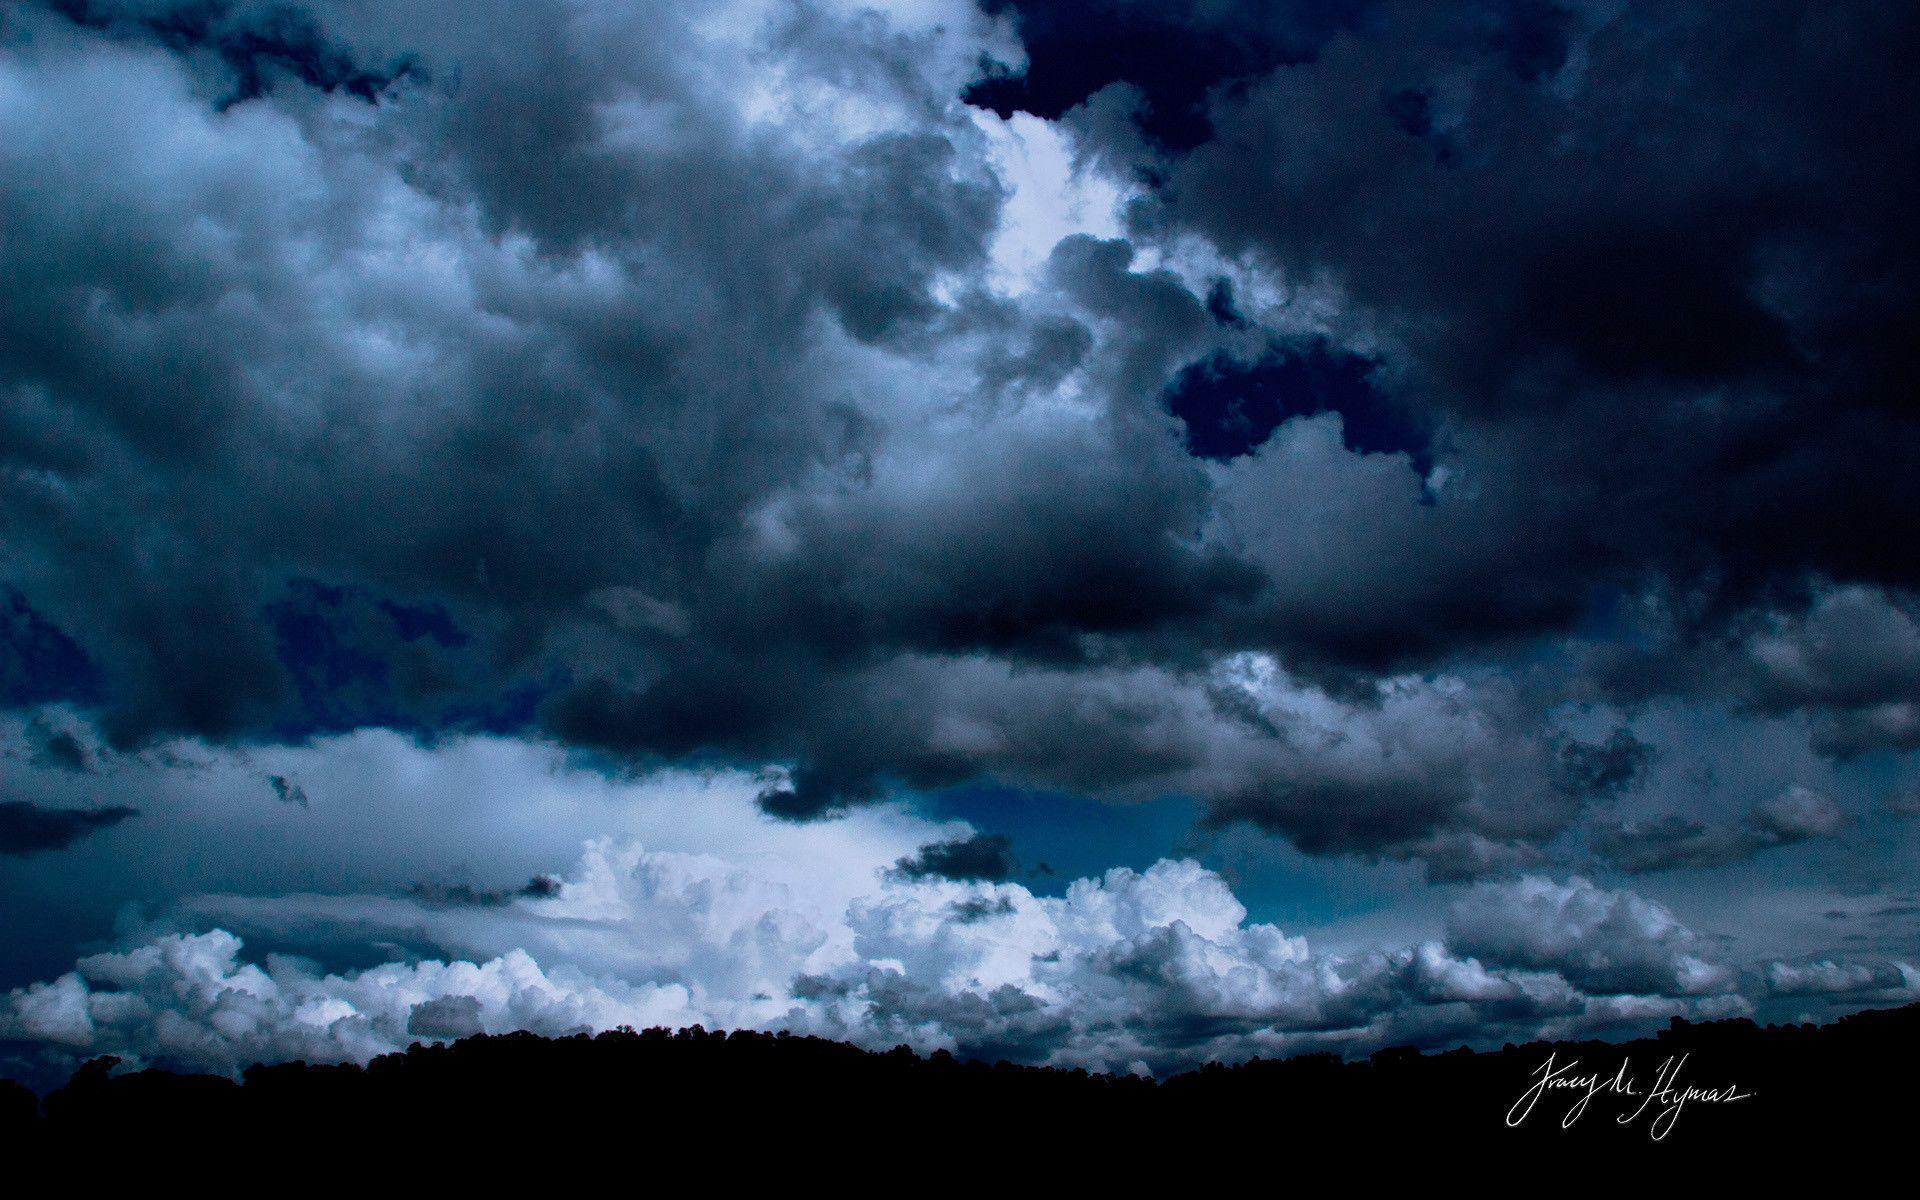 Dark sky photo